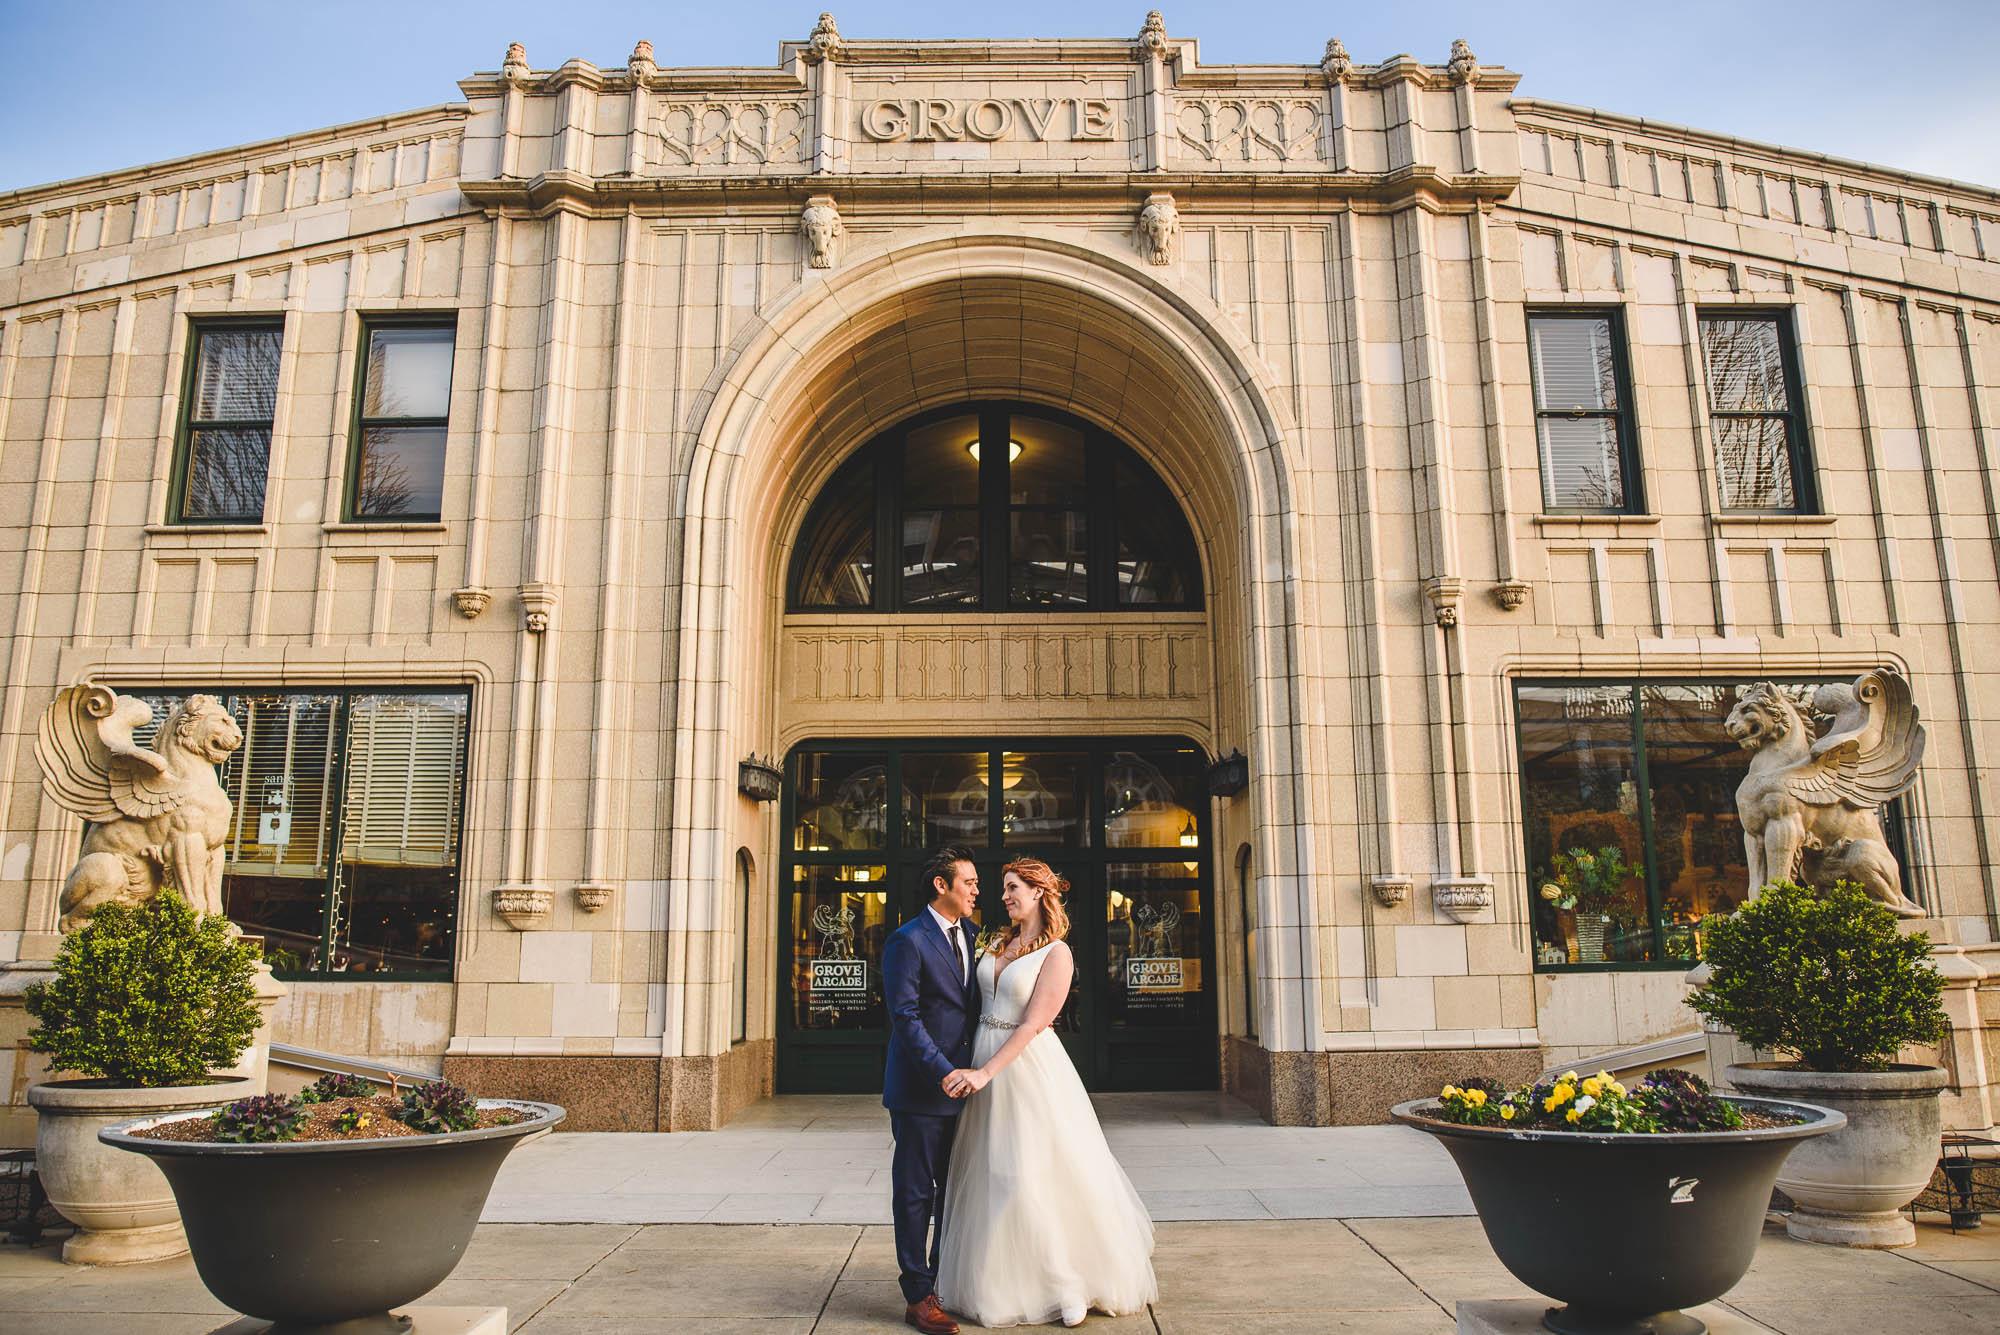 Grove Arcade wedding portrait